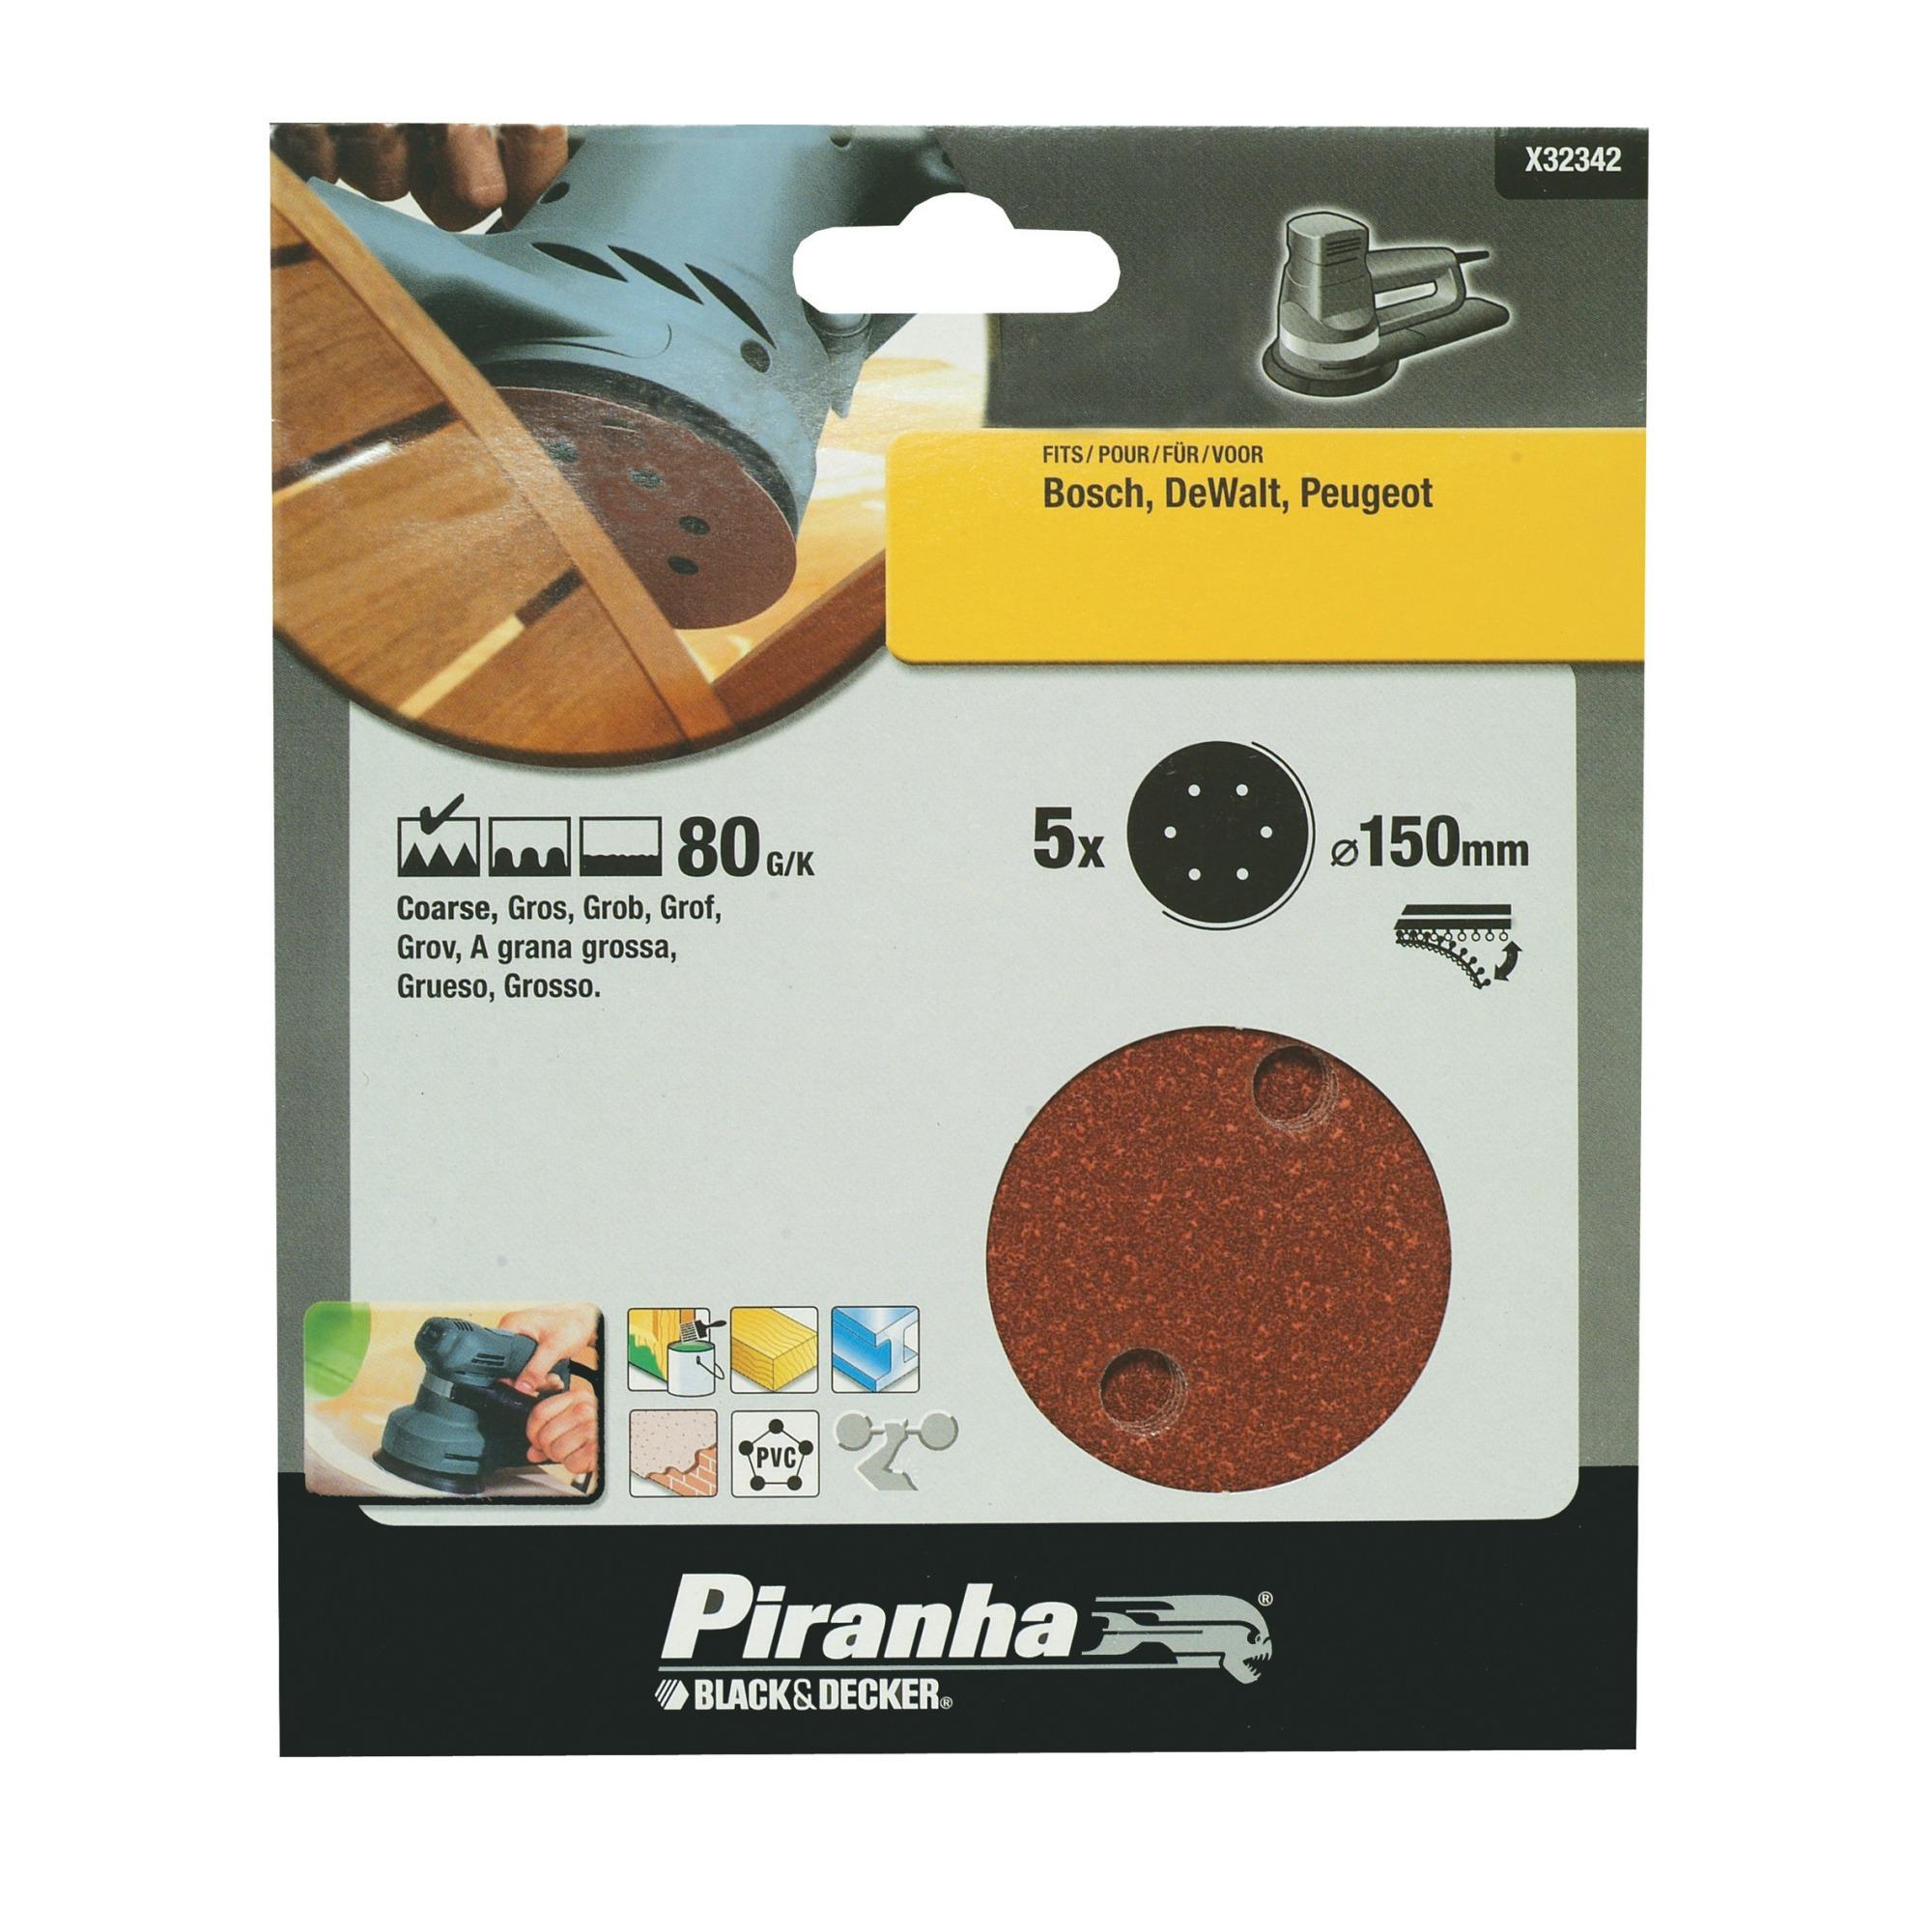 Piranha schuurschijf X32342-XJ K80 150 mm (5 stuks)